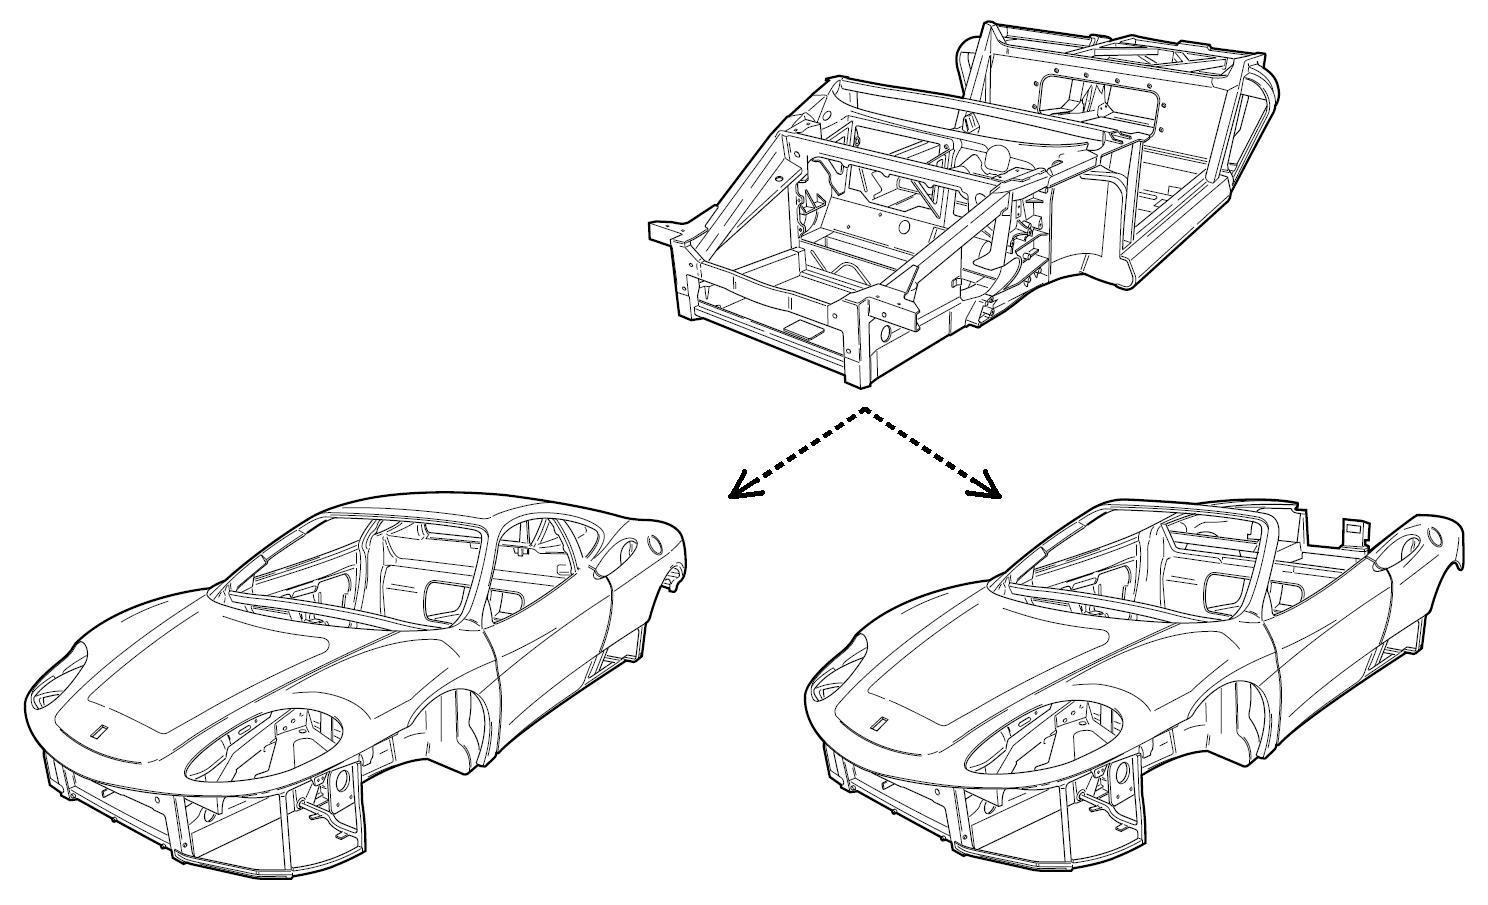 Ferrari 355 Wiring Diagram Online Manuual Of 308 360 Diagrams Library Rh 68 Skriptoase De F355